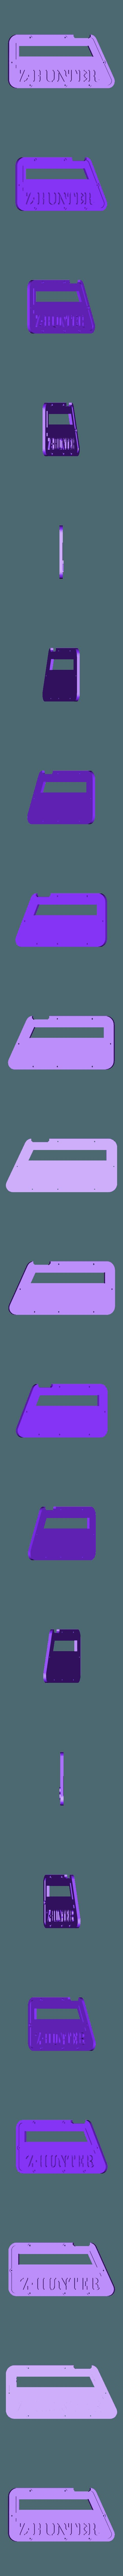 VITRES AV DROITE.stl Download STL file Shields for Carisma LYNX (zombie hunter) • 3D printing design, RCGANG93